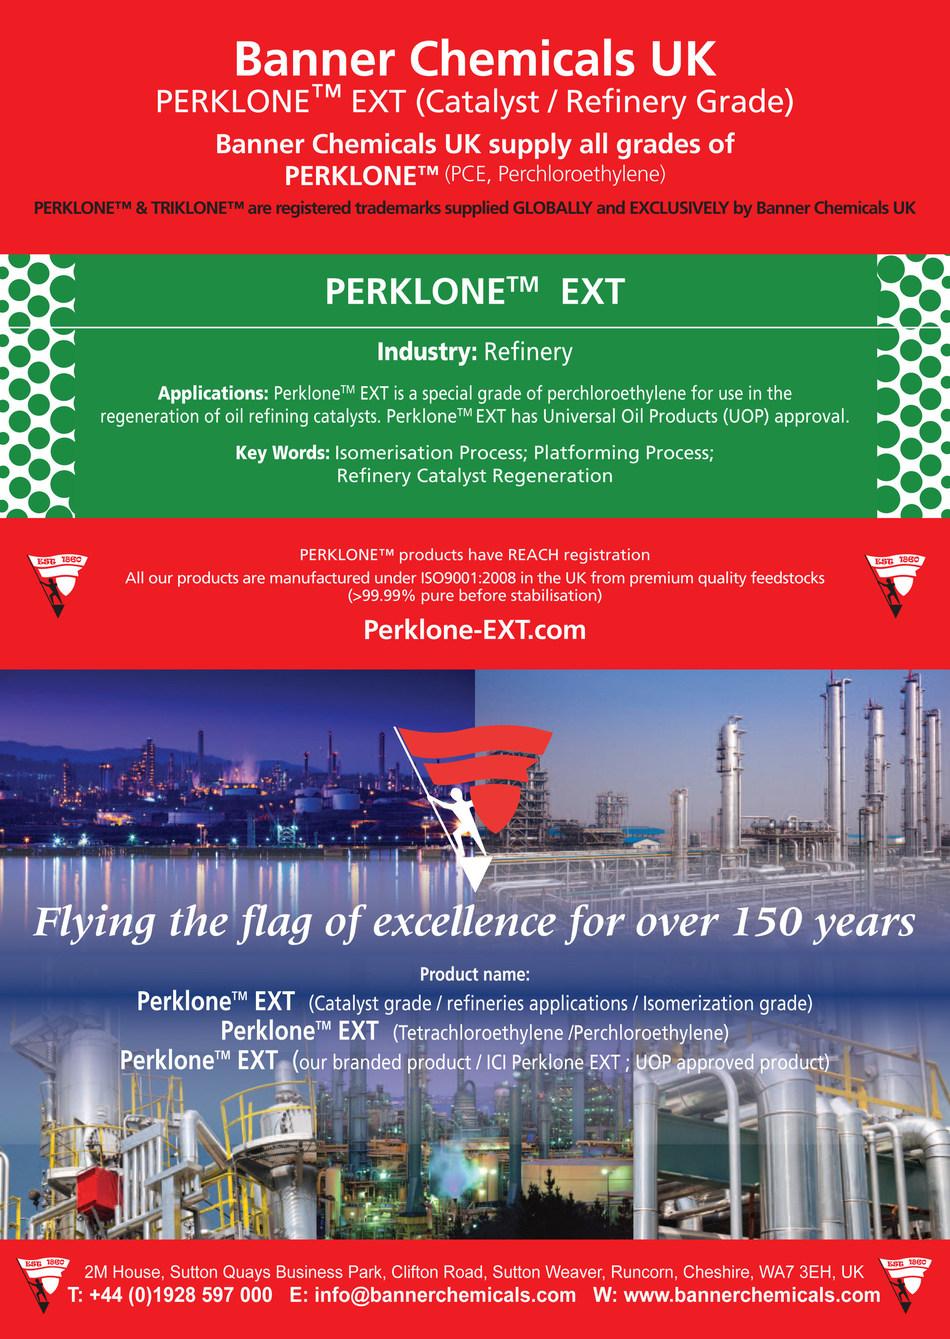 PERKLONE™ EXT Catalyst , Isomerization Grade Banner Chemicals UK